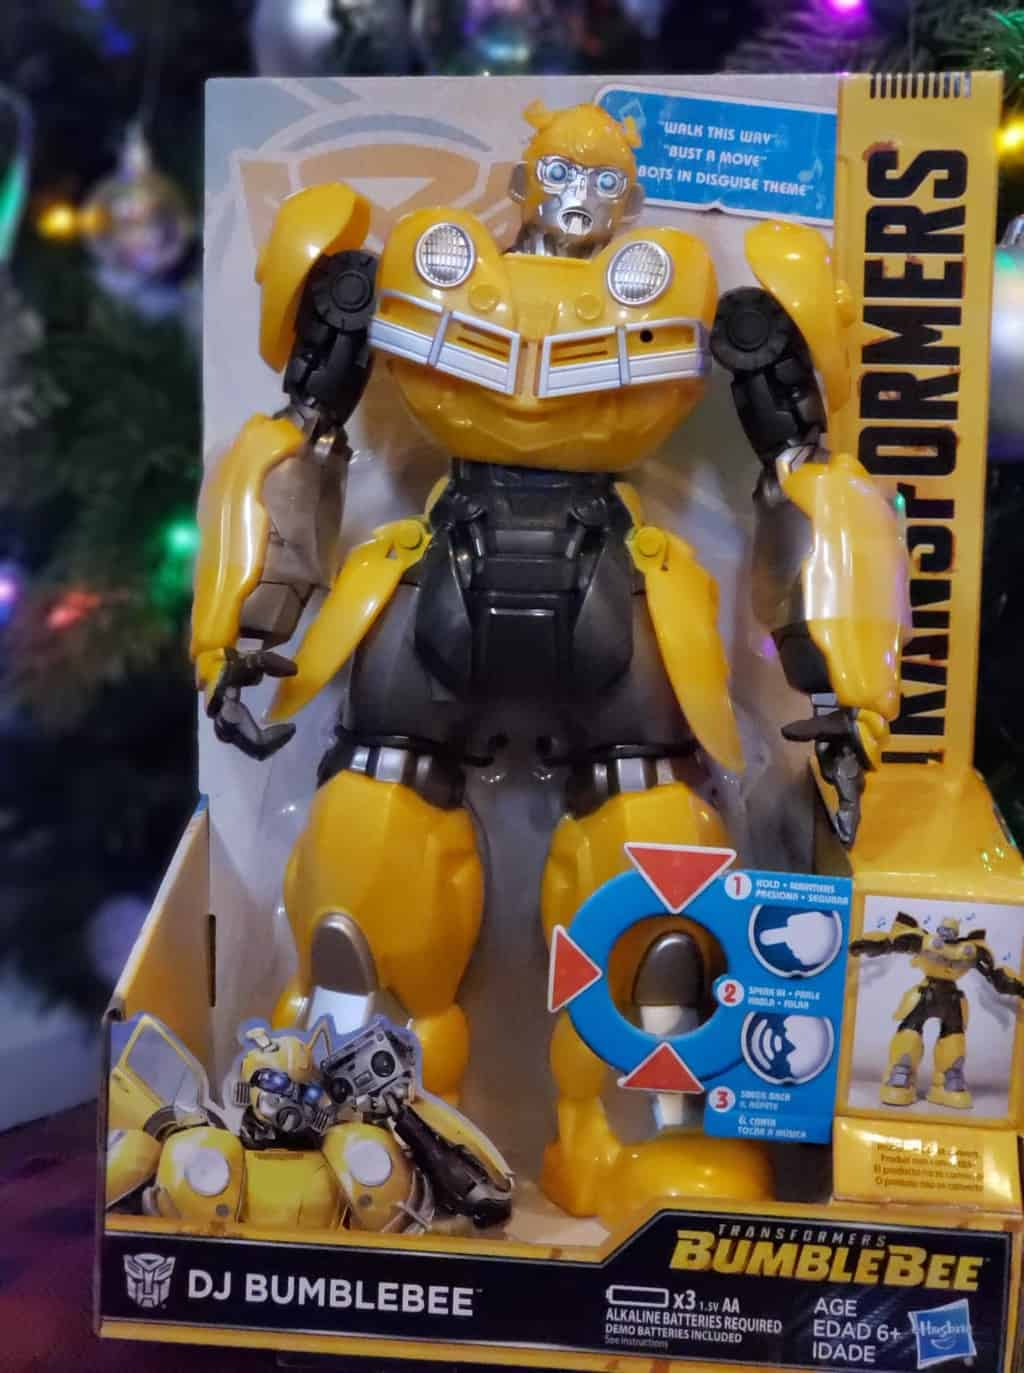 DJ Bumblebee